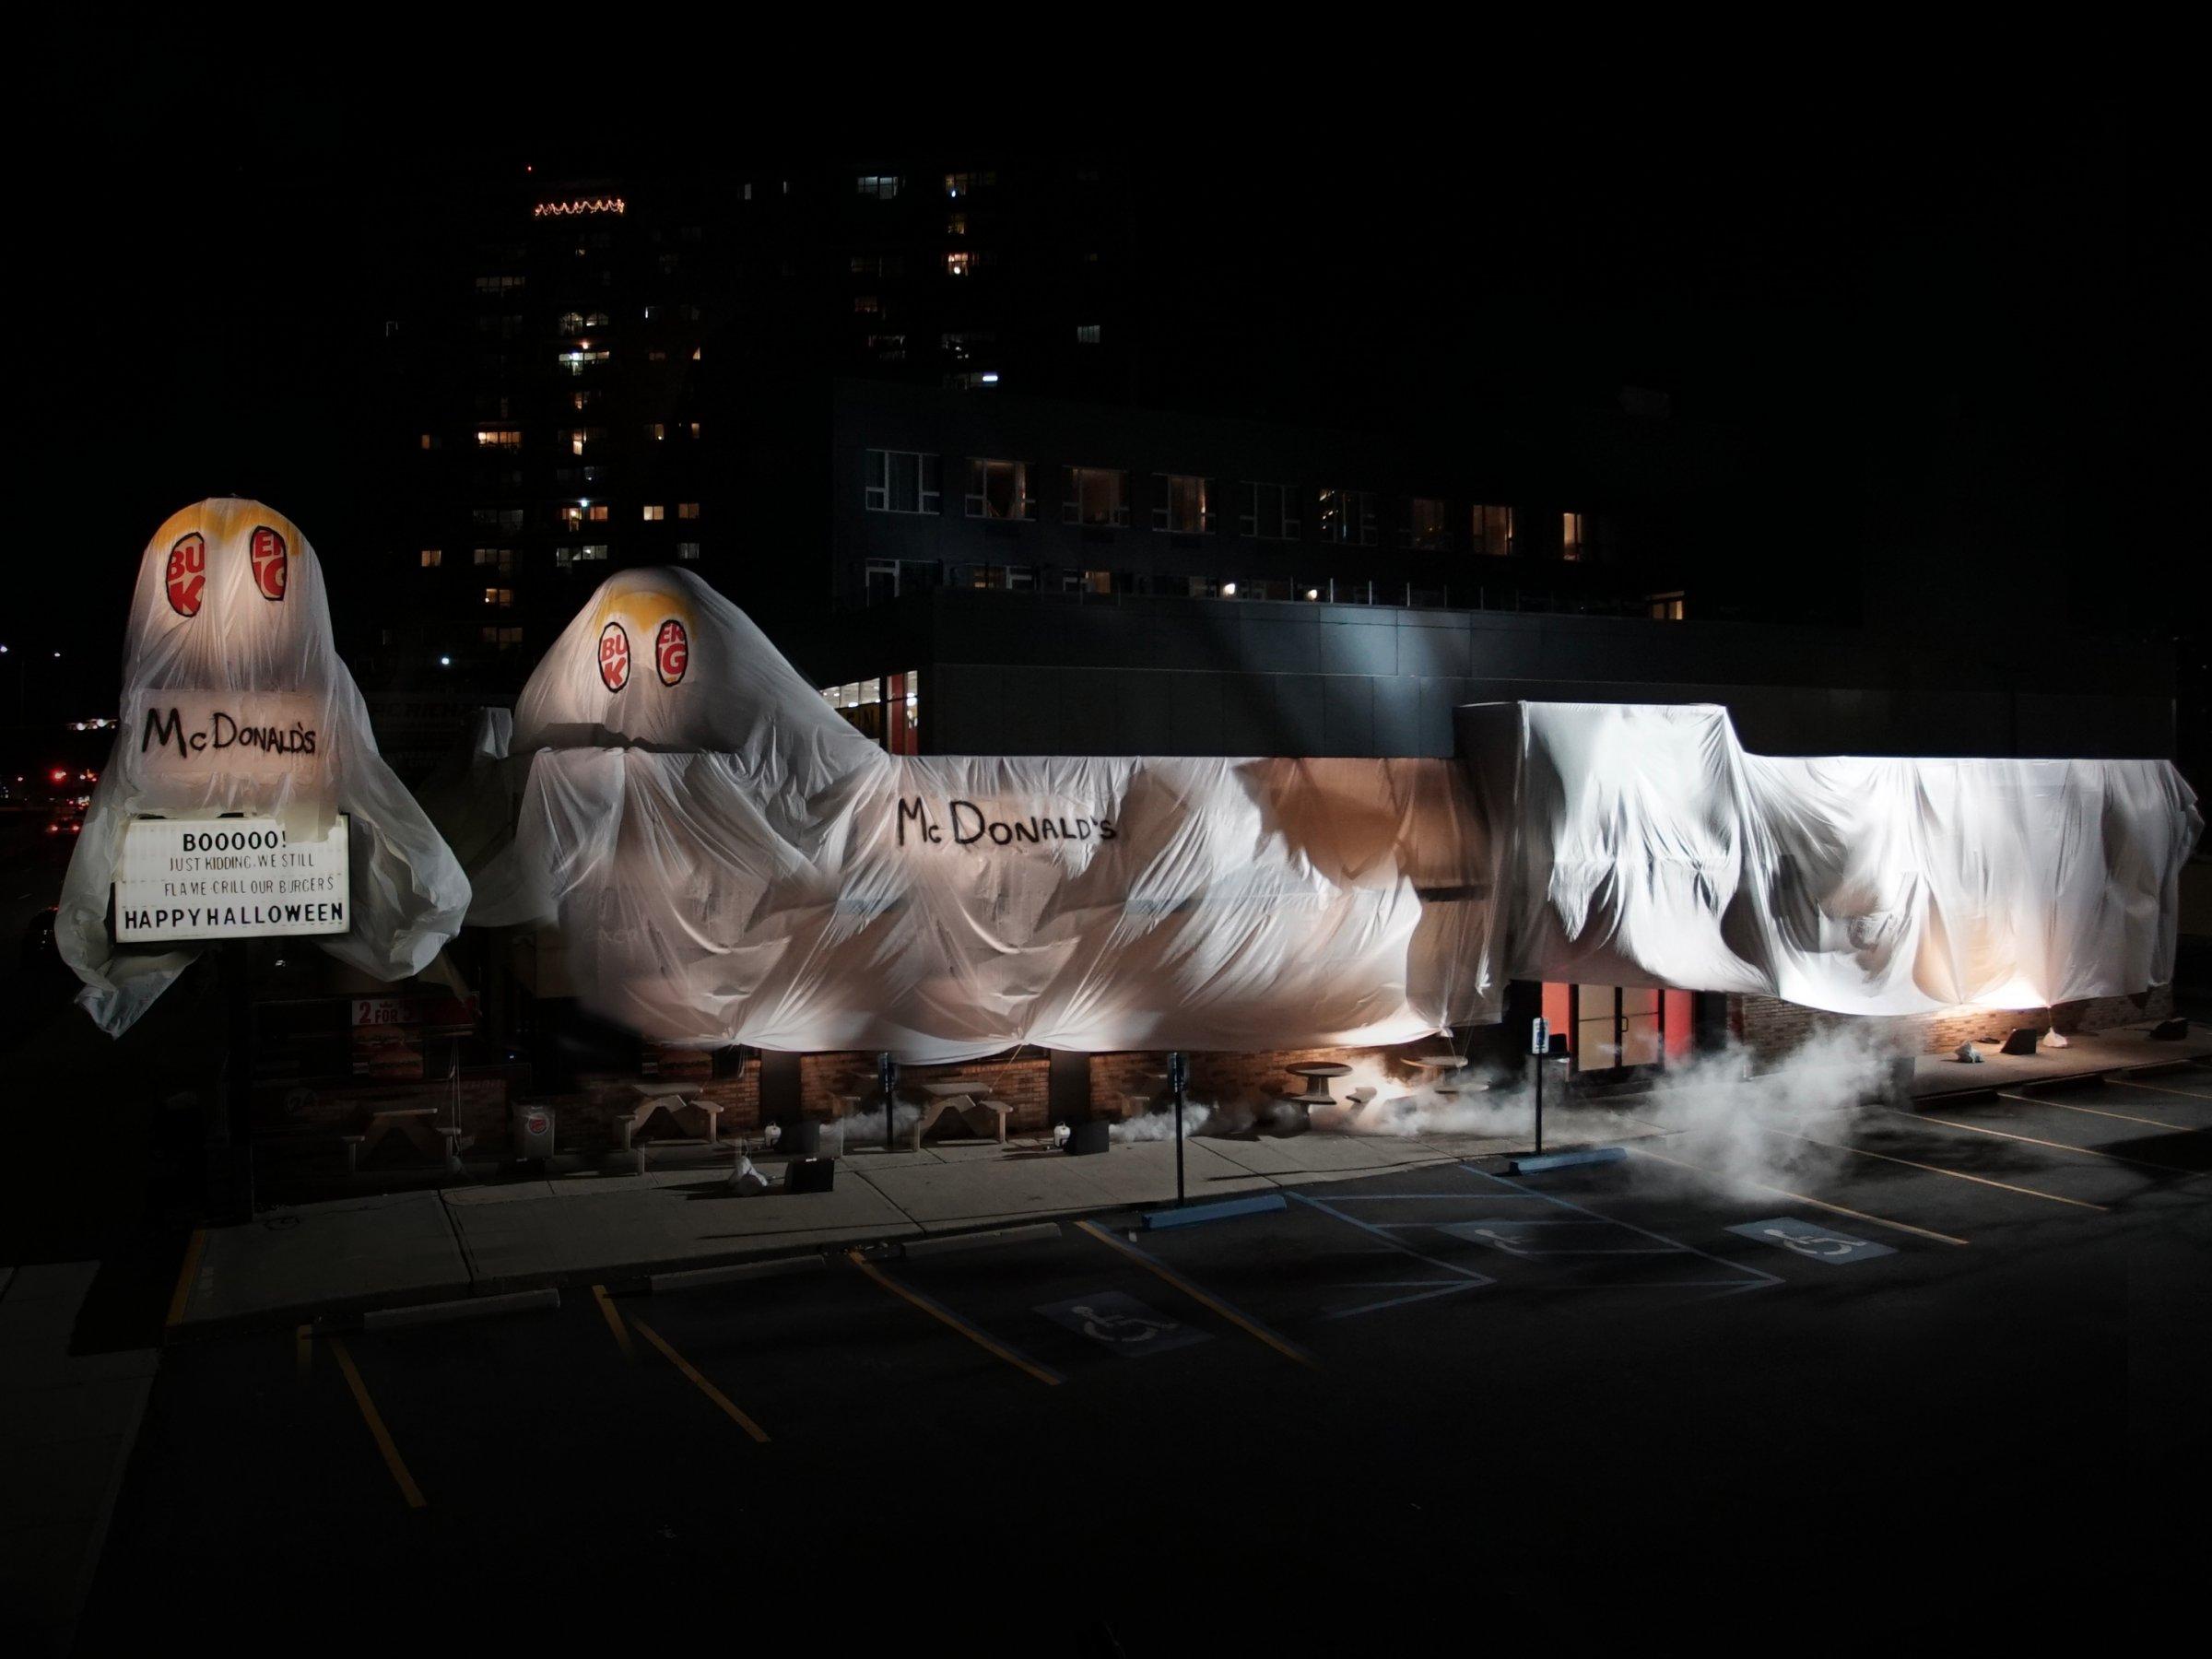 burger-king-mcdonalds_4